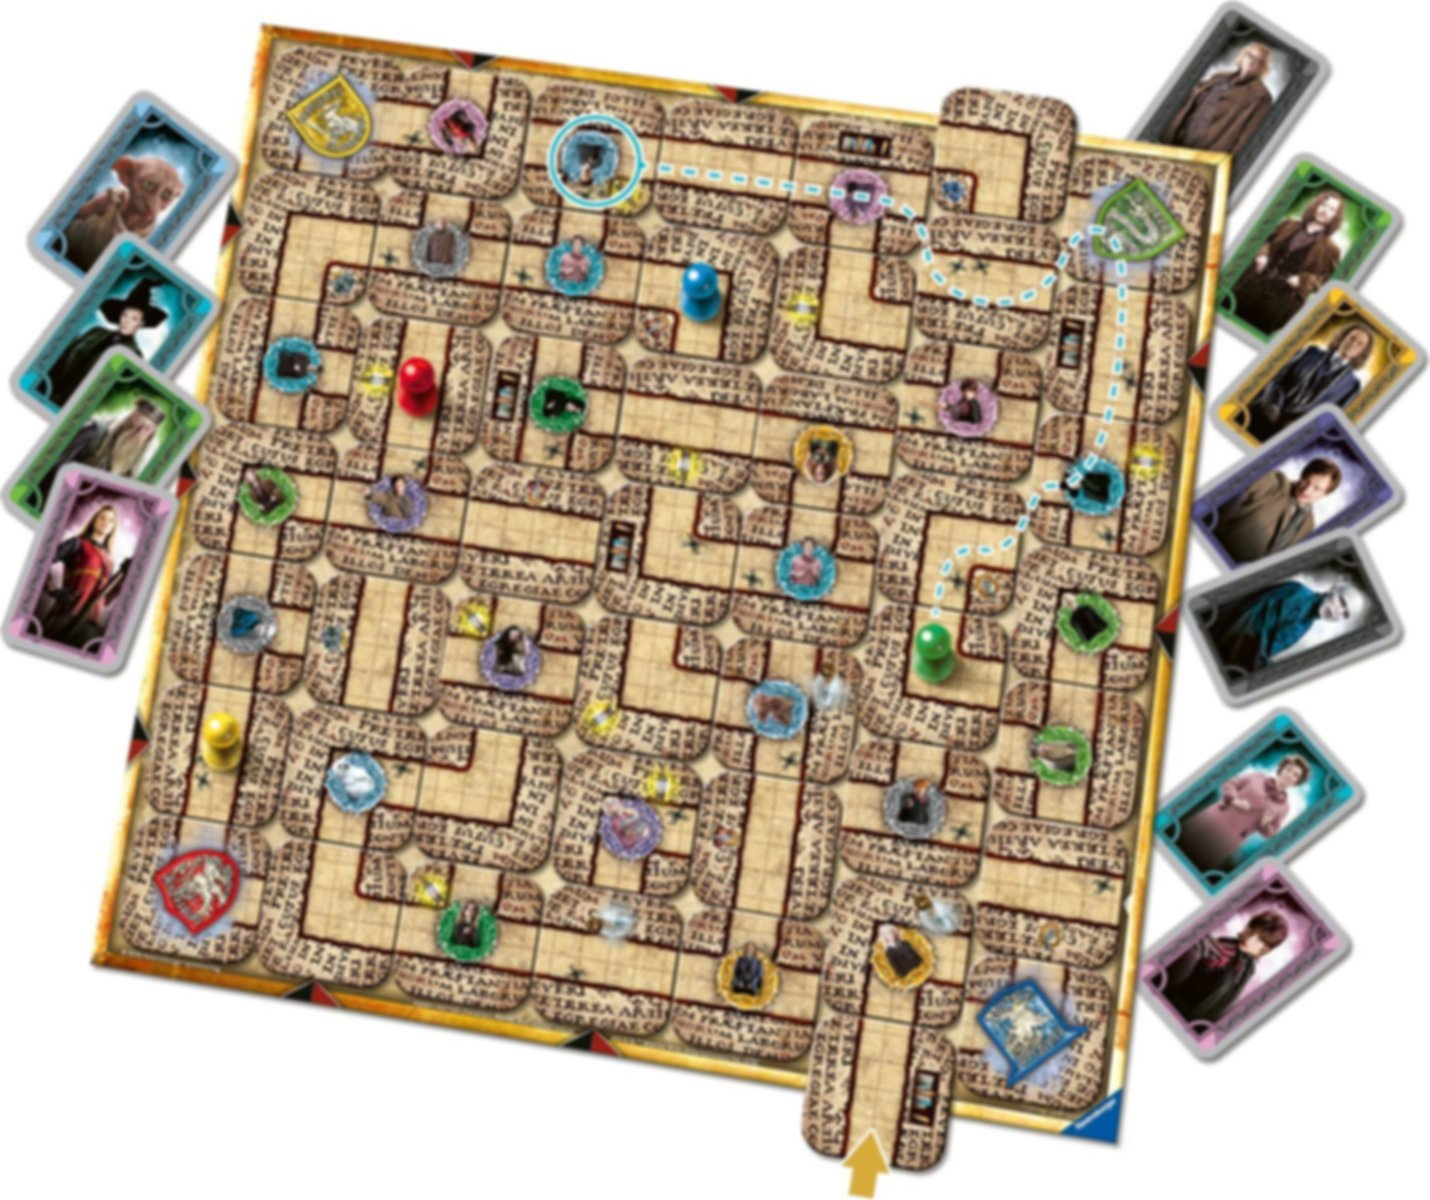 Harry Potter Labyrinth components